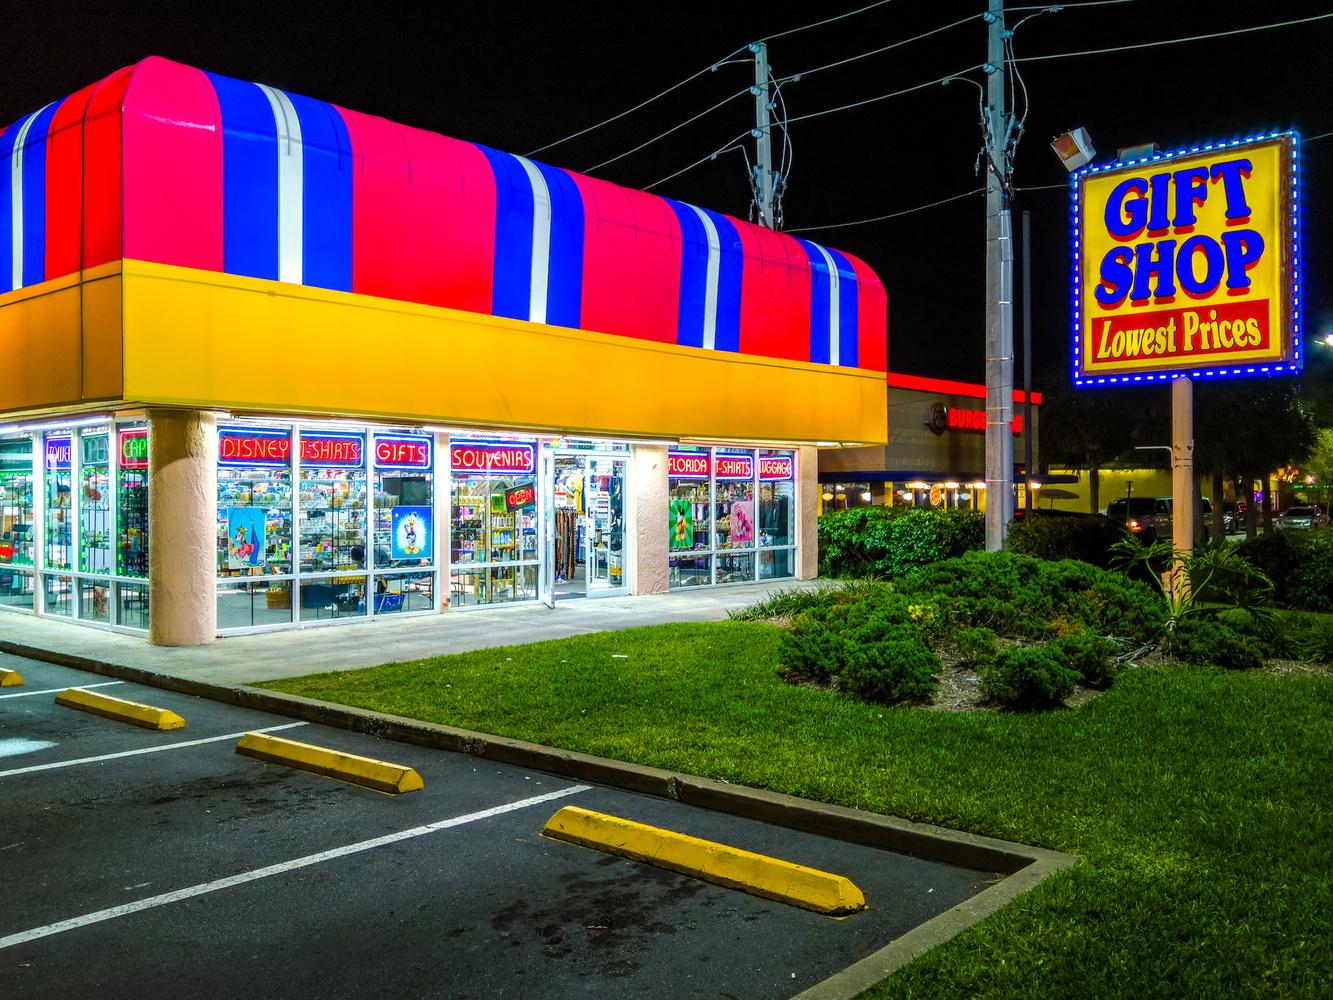 Gift Shop by Frazer Waller